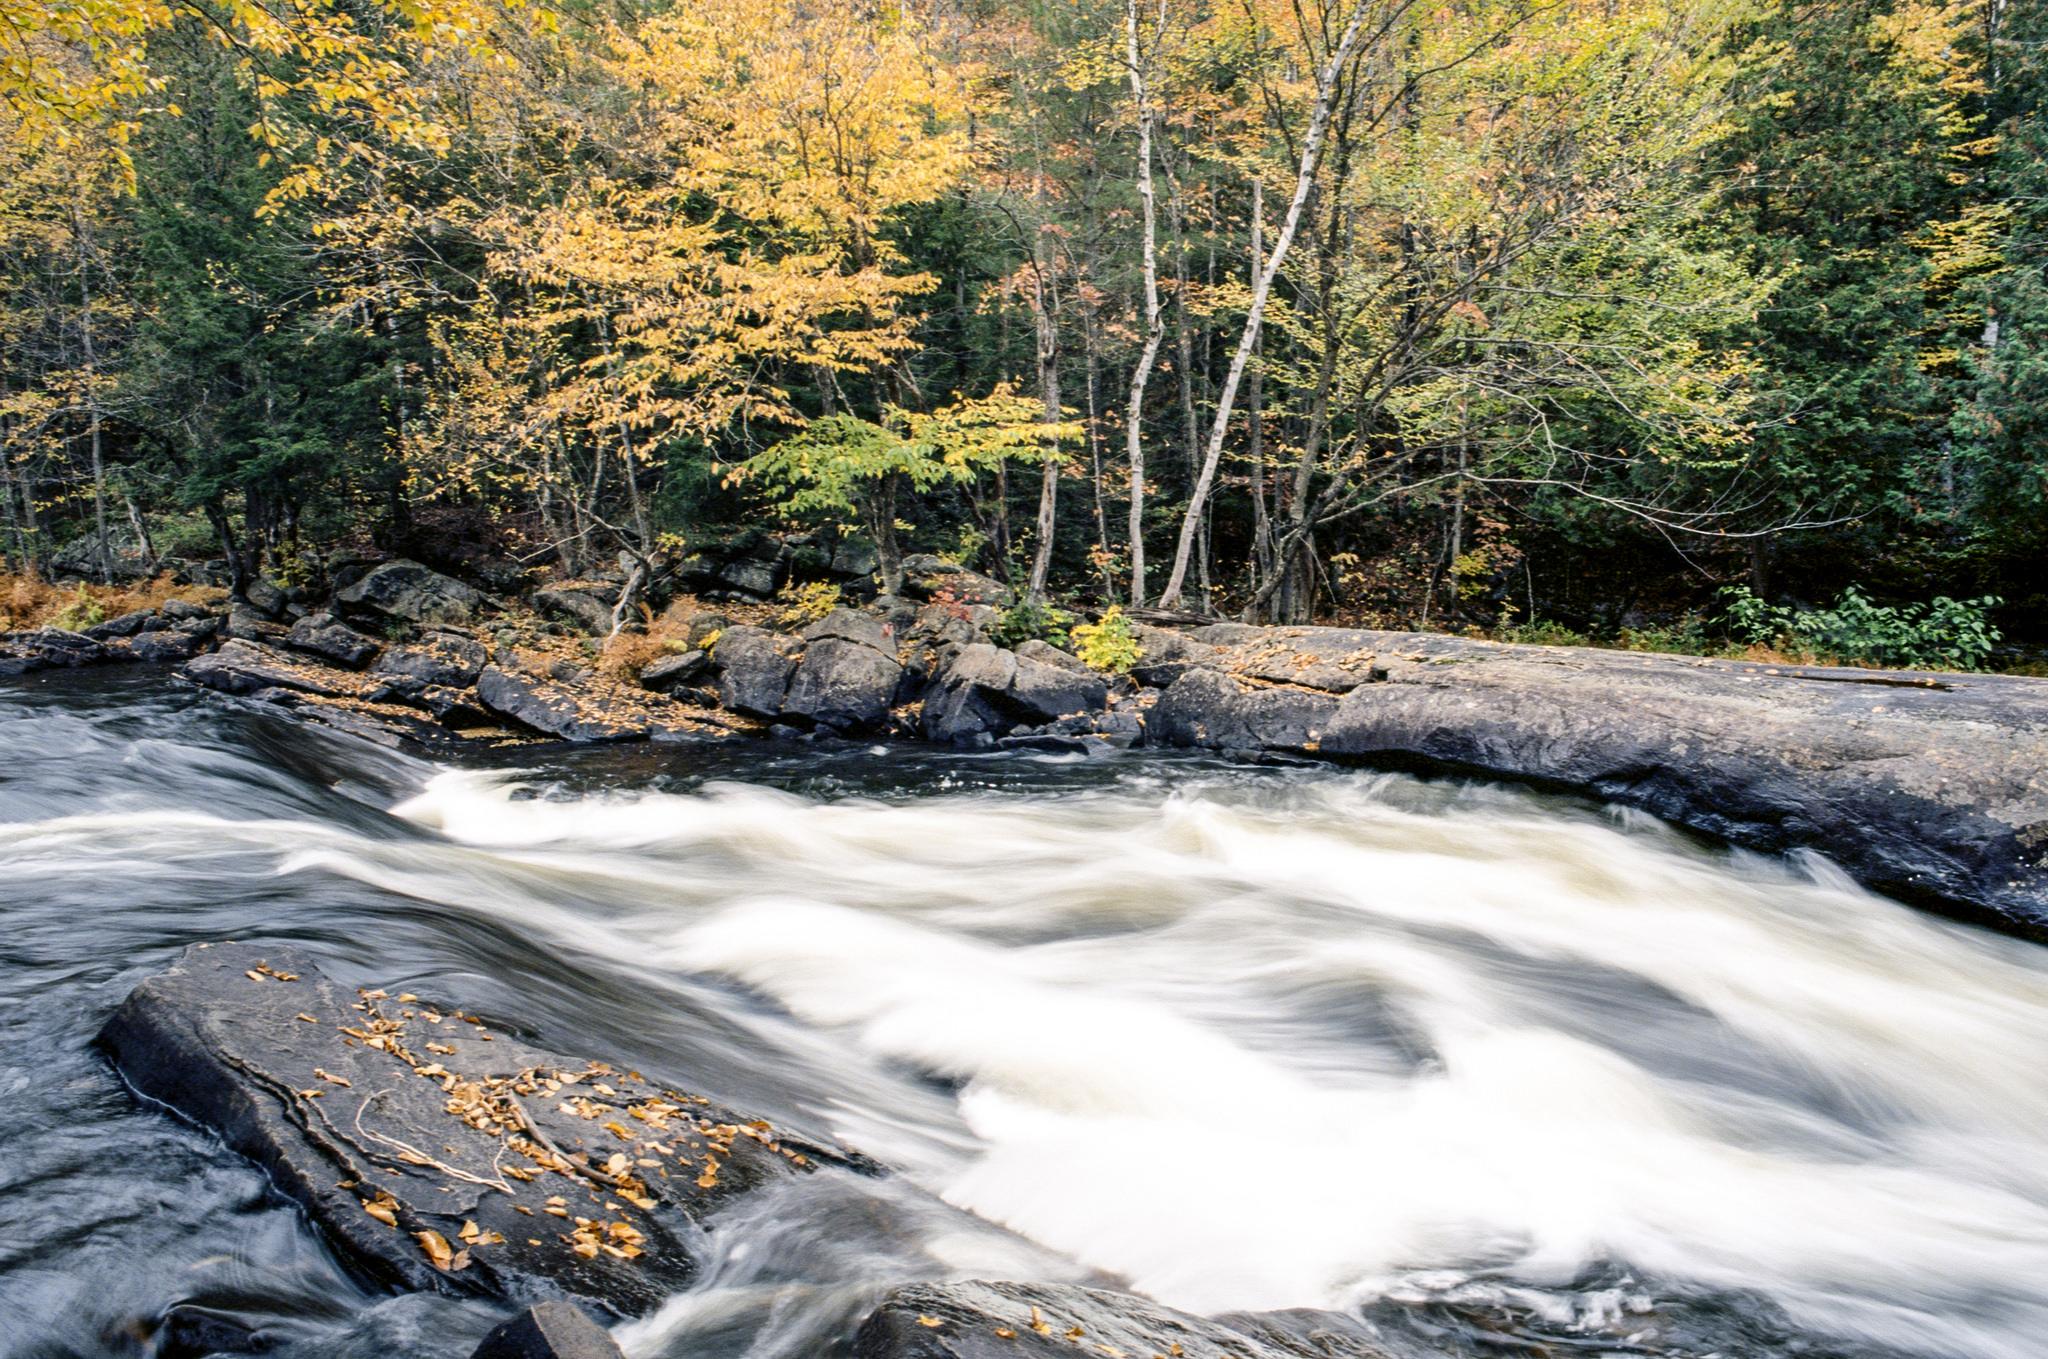 Bill Smith | Oxtongue Rapids | Nikon F3HP | 105 f2.5 AIS Nikkor | Kodak Ektar 100